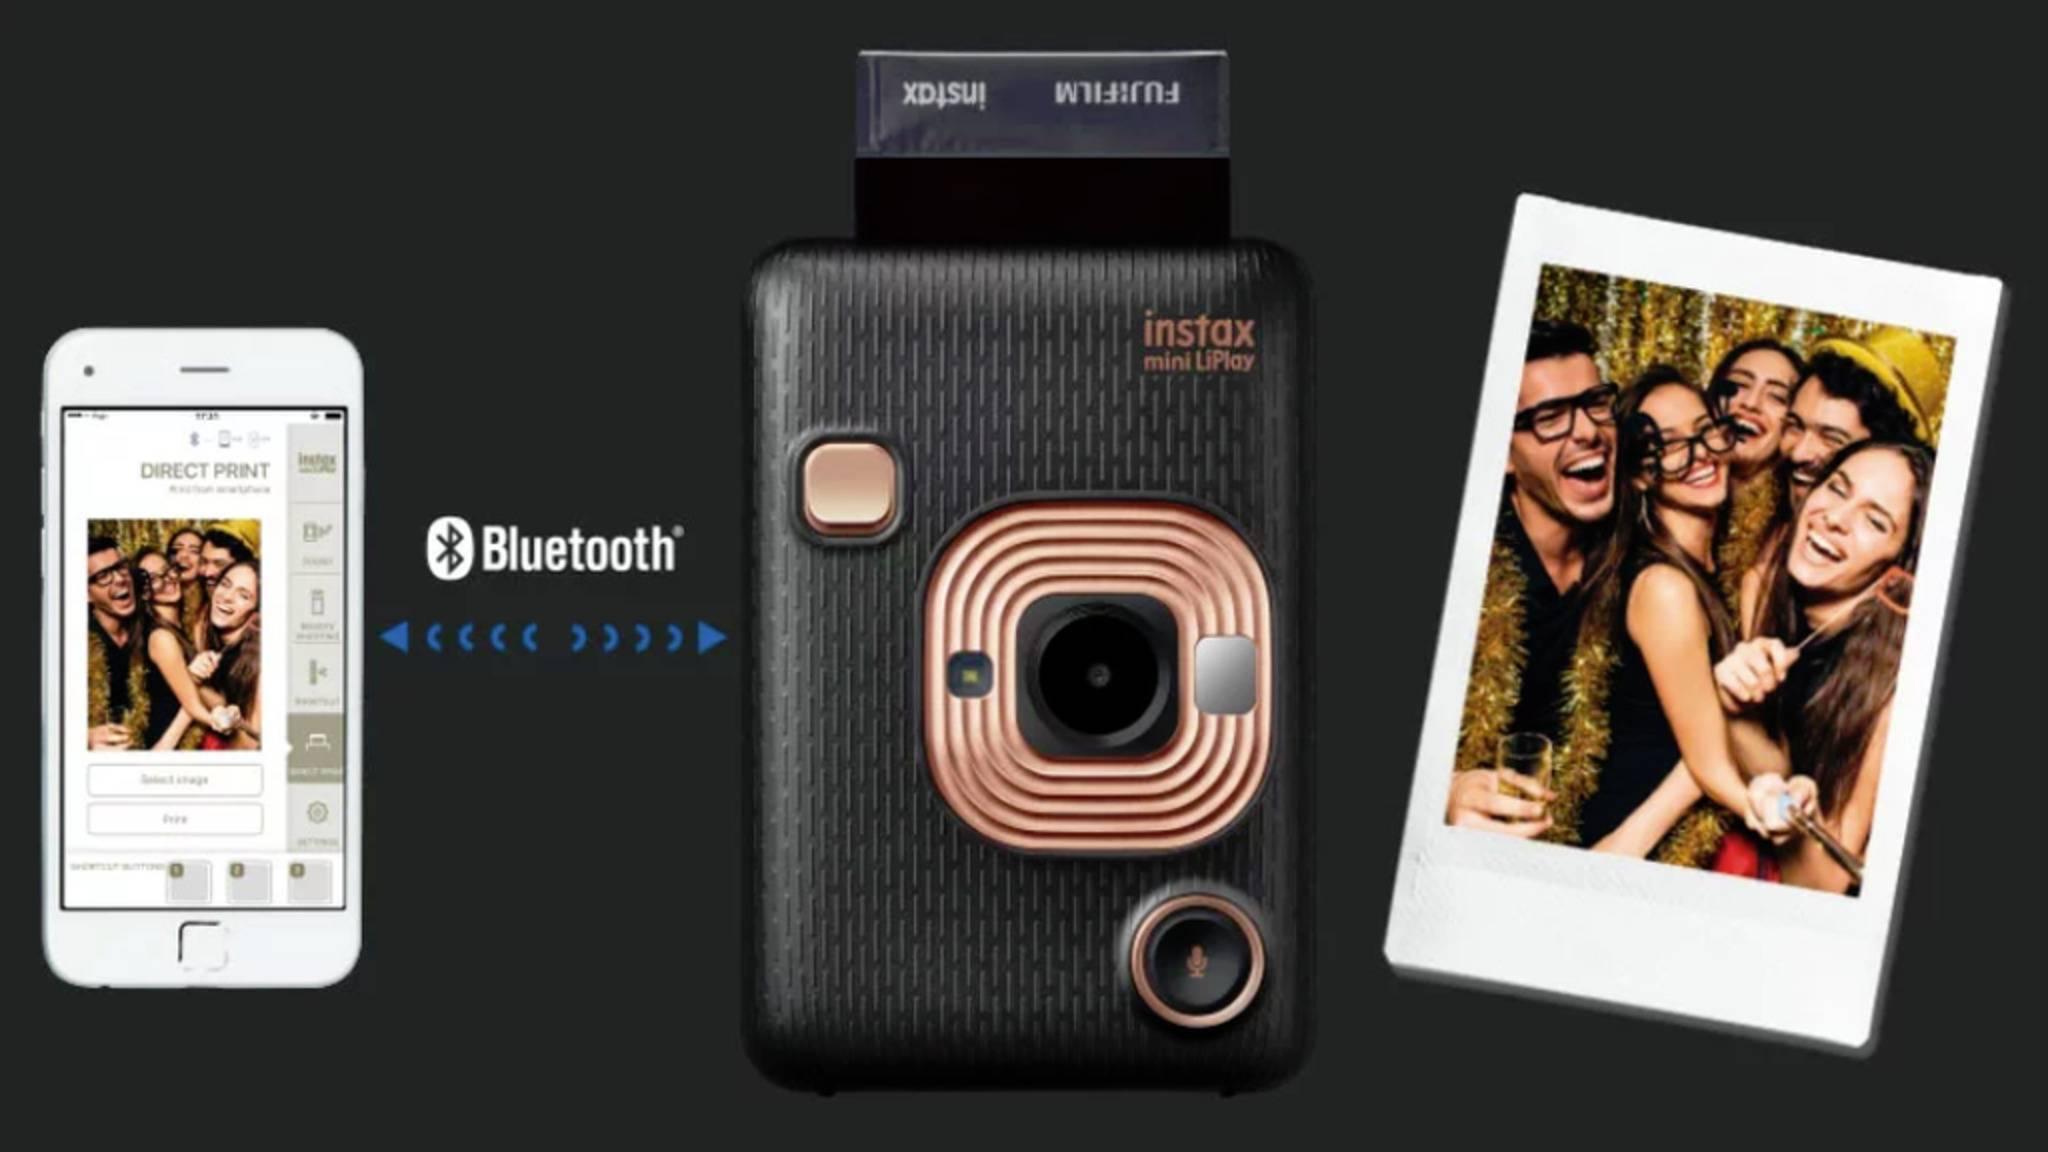 Die Sofortbildkamera Fujifilm Instax Mini LiPlay kann auch Ton aufnehmen.